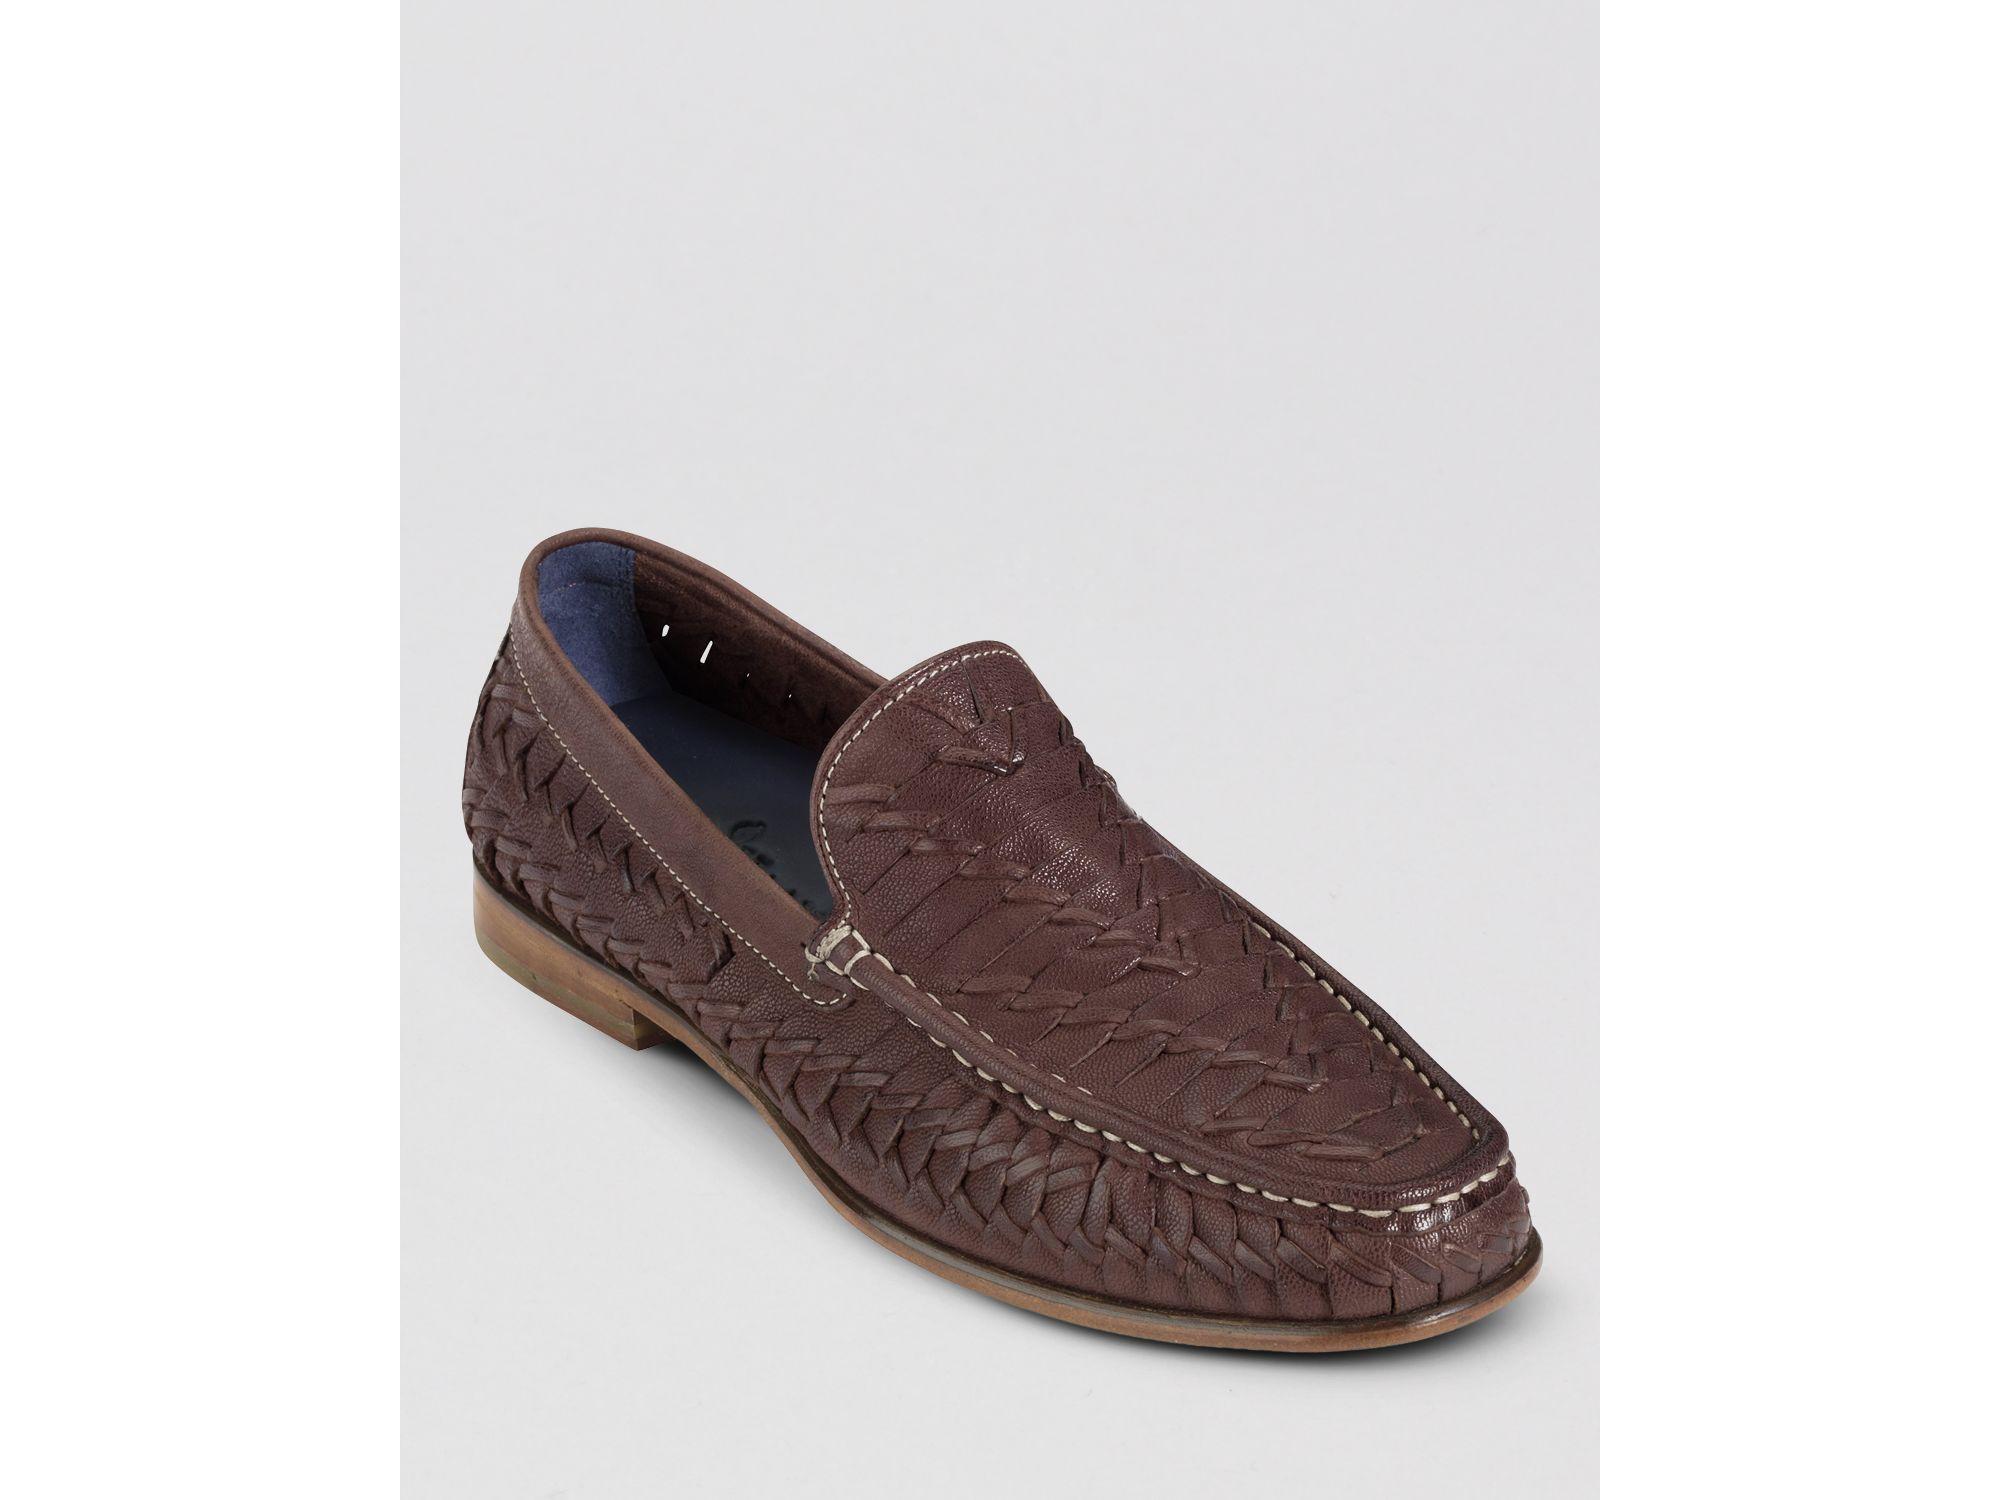 0b9dcda00d5 Lyst - Cole Haan Air Tremont Huarache Weave Venetian Loafers for Men